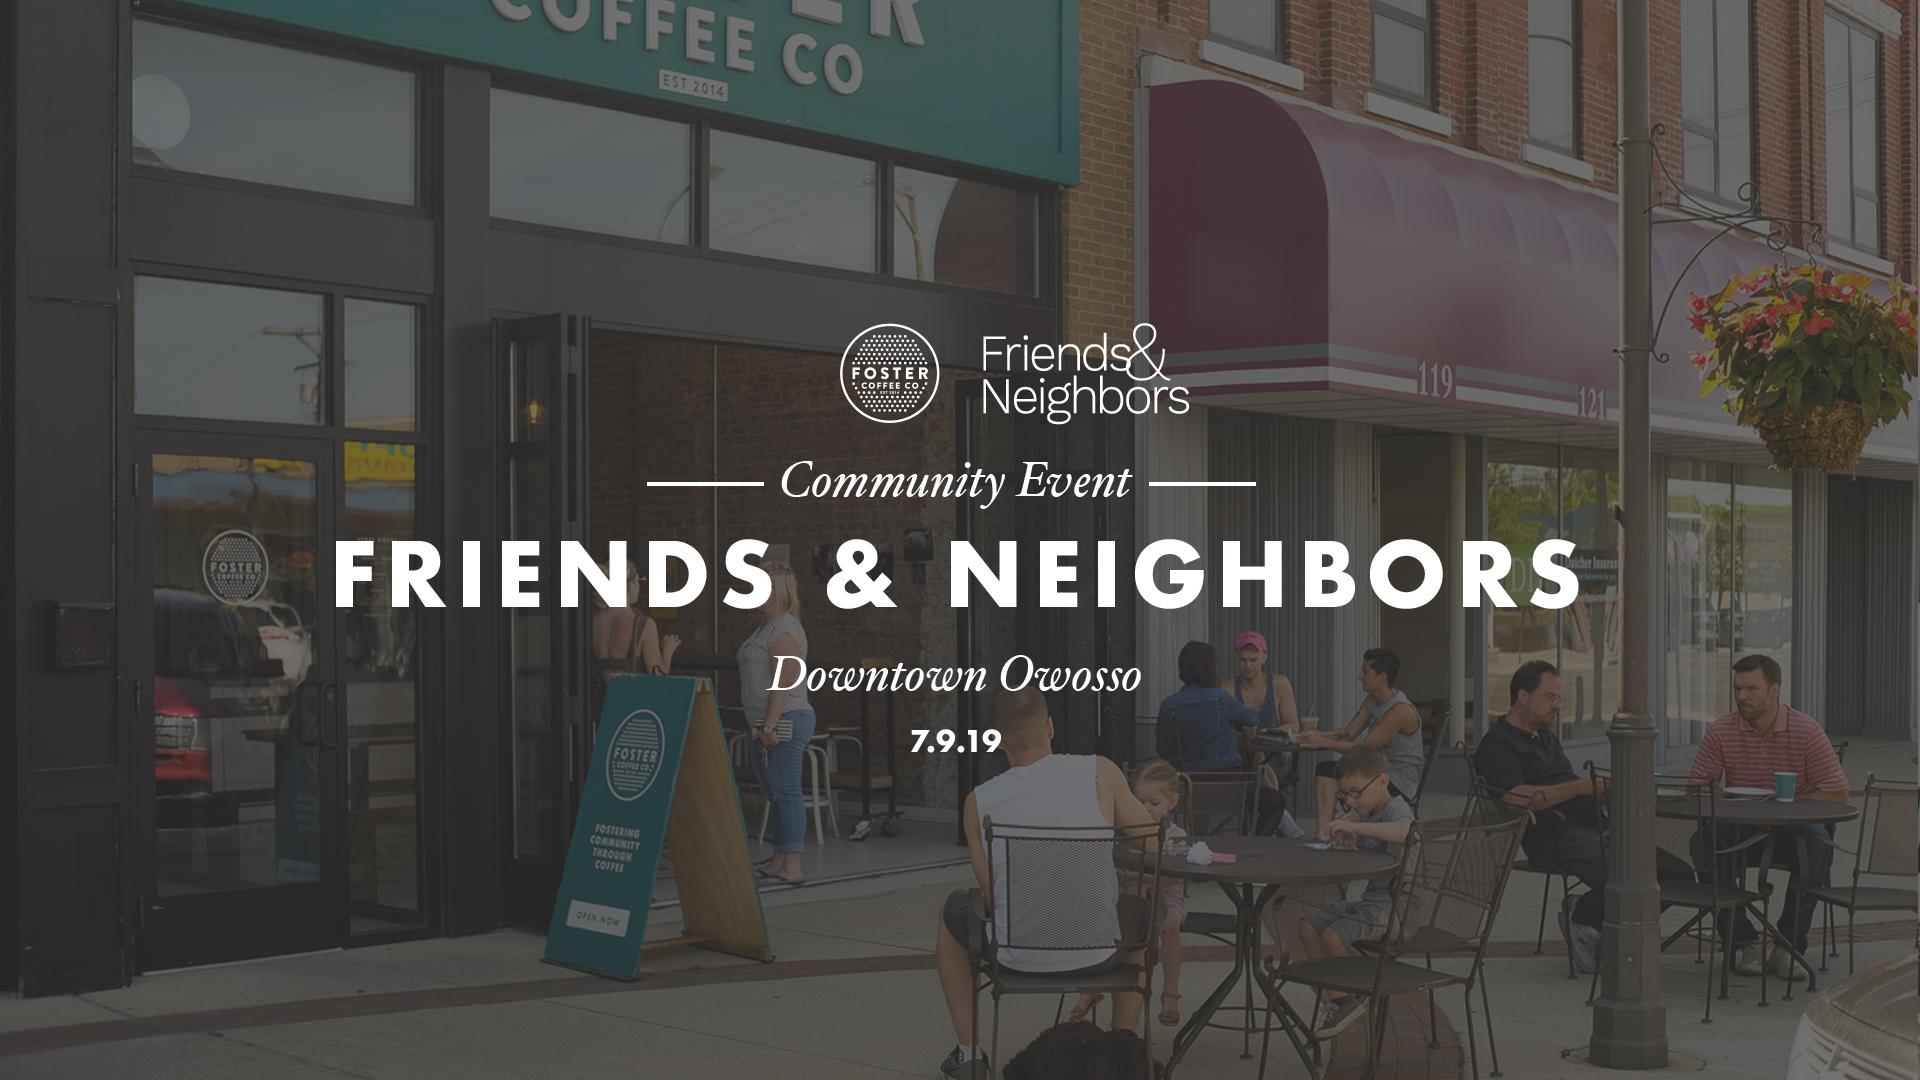 Friends&Neighbors_7.9.19.jpg